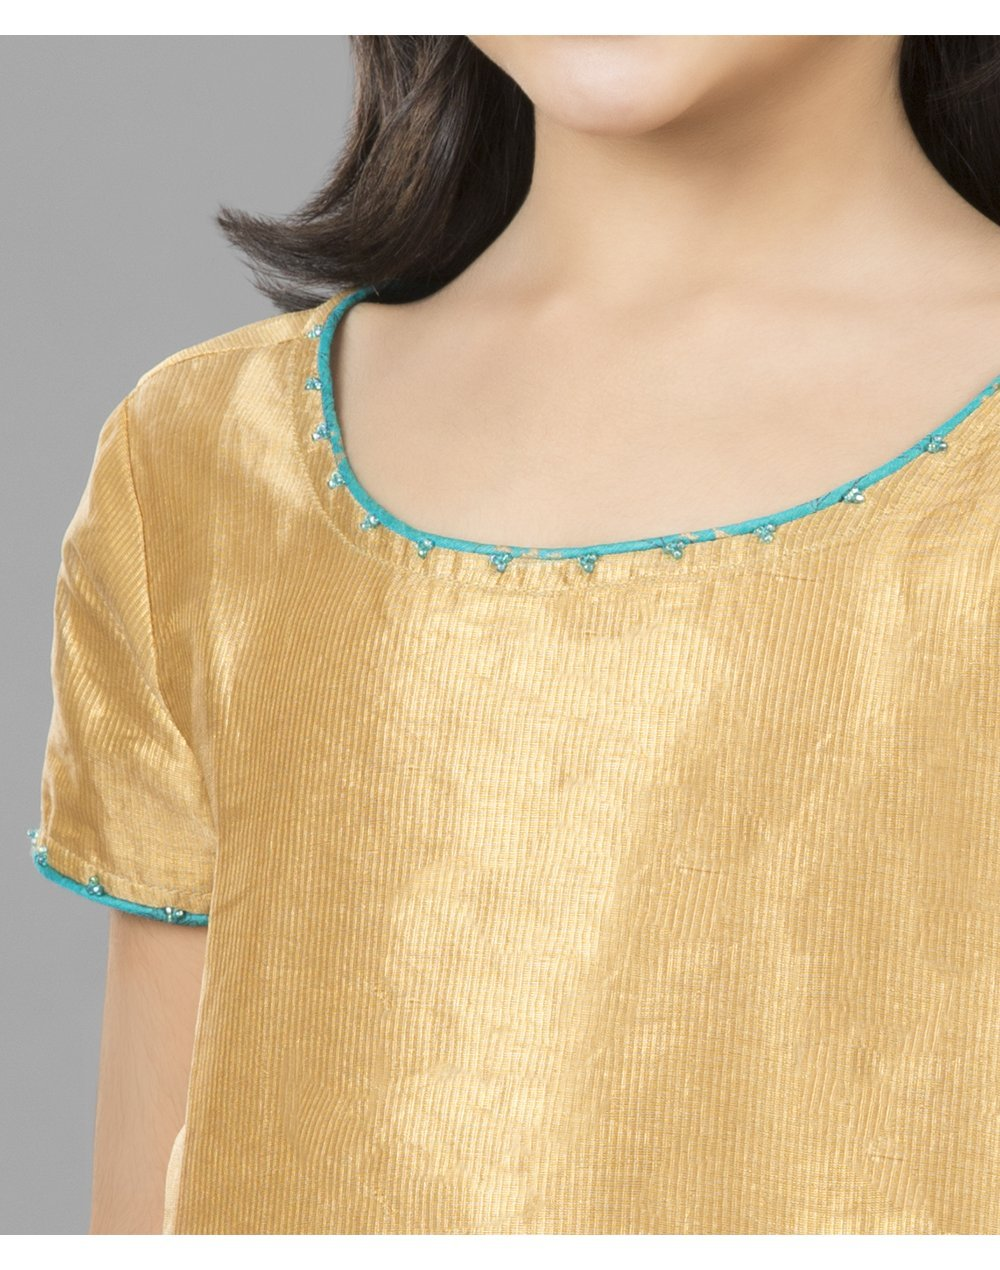 Fabindia Girls Silk Cotton Choli Back Tie Lehenga Set 6-8Yr by Fabindia (Image #1)